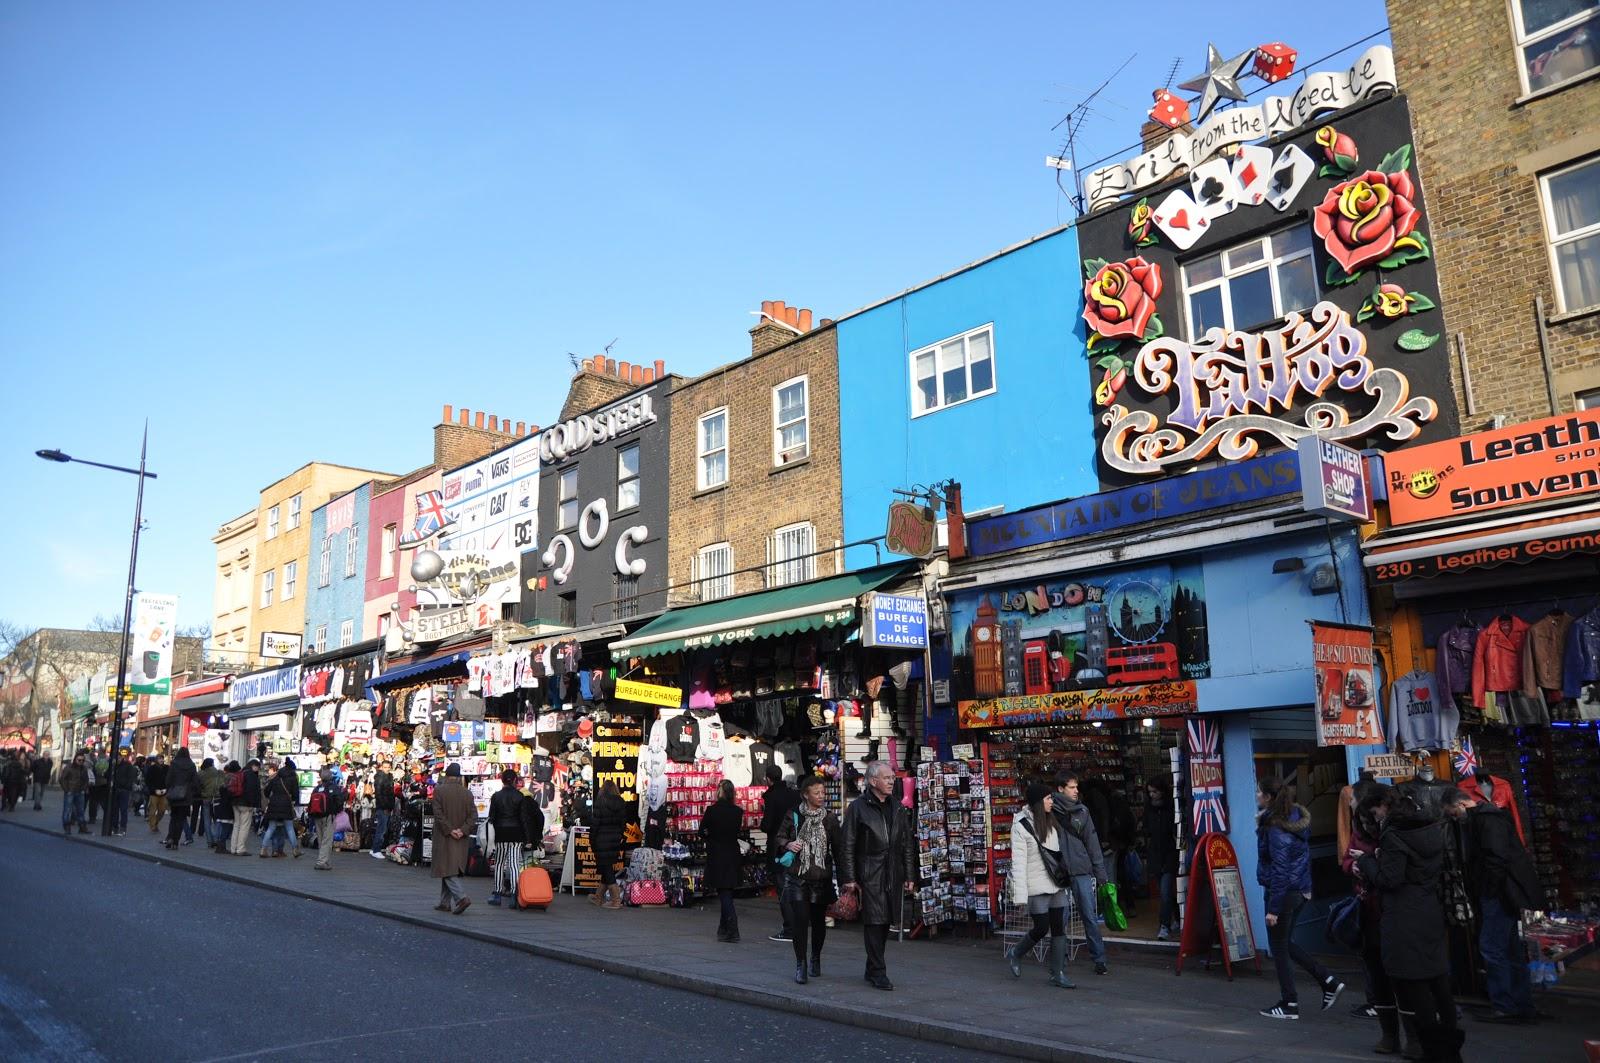 Camden Market - London\'s best market if you ask me